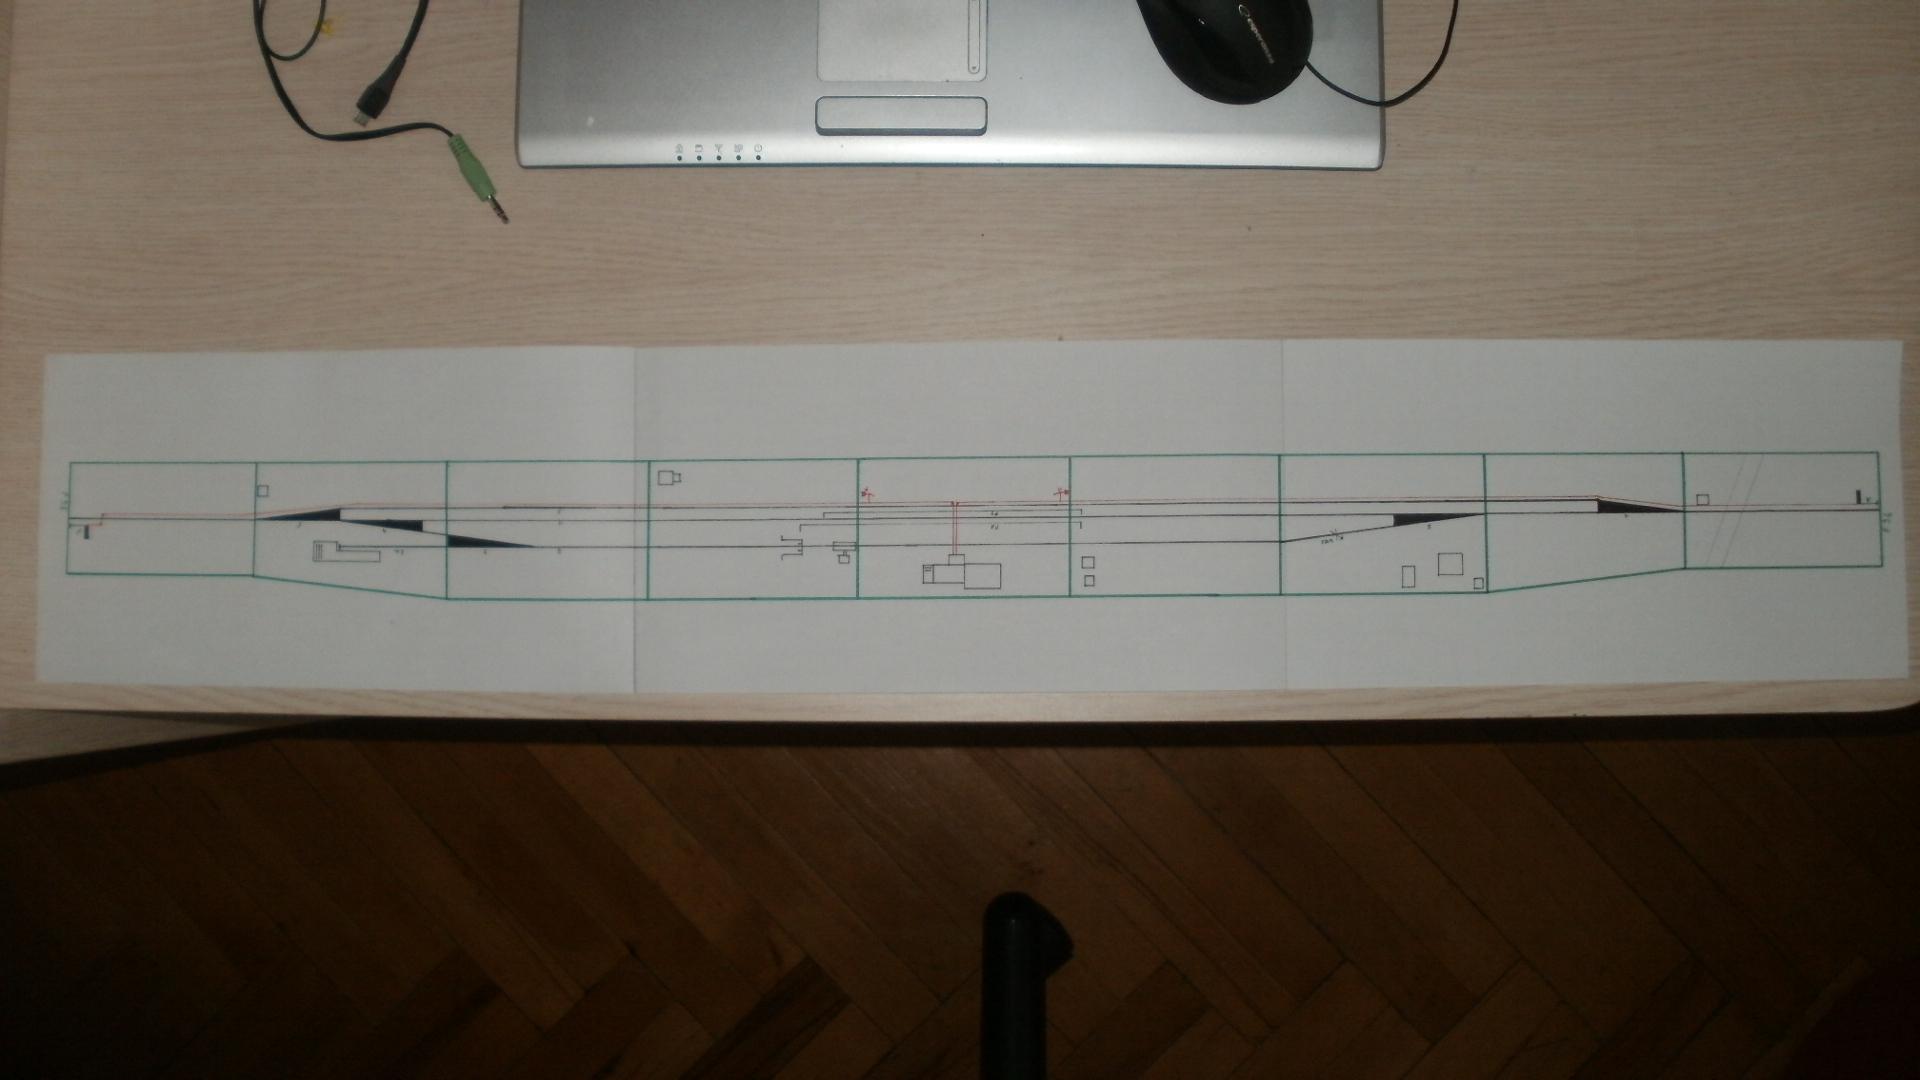 P1011831.JPG